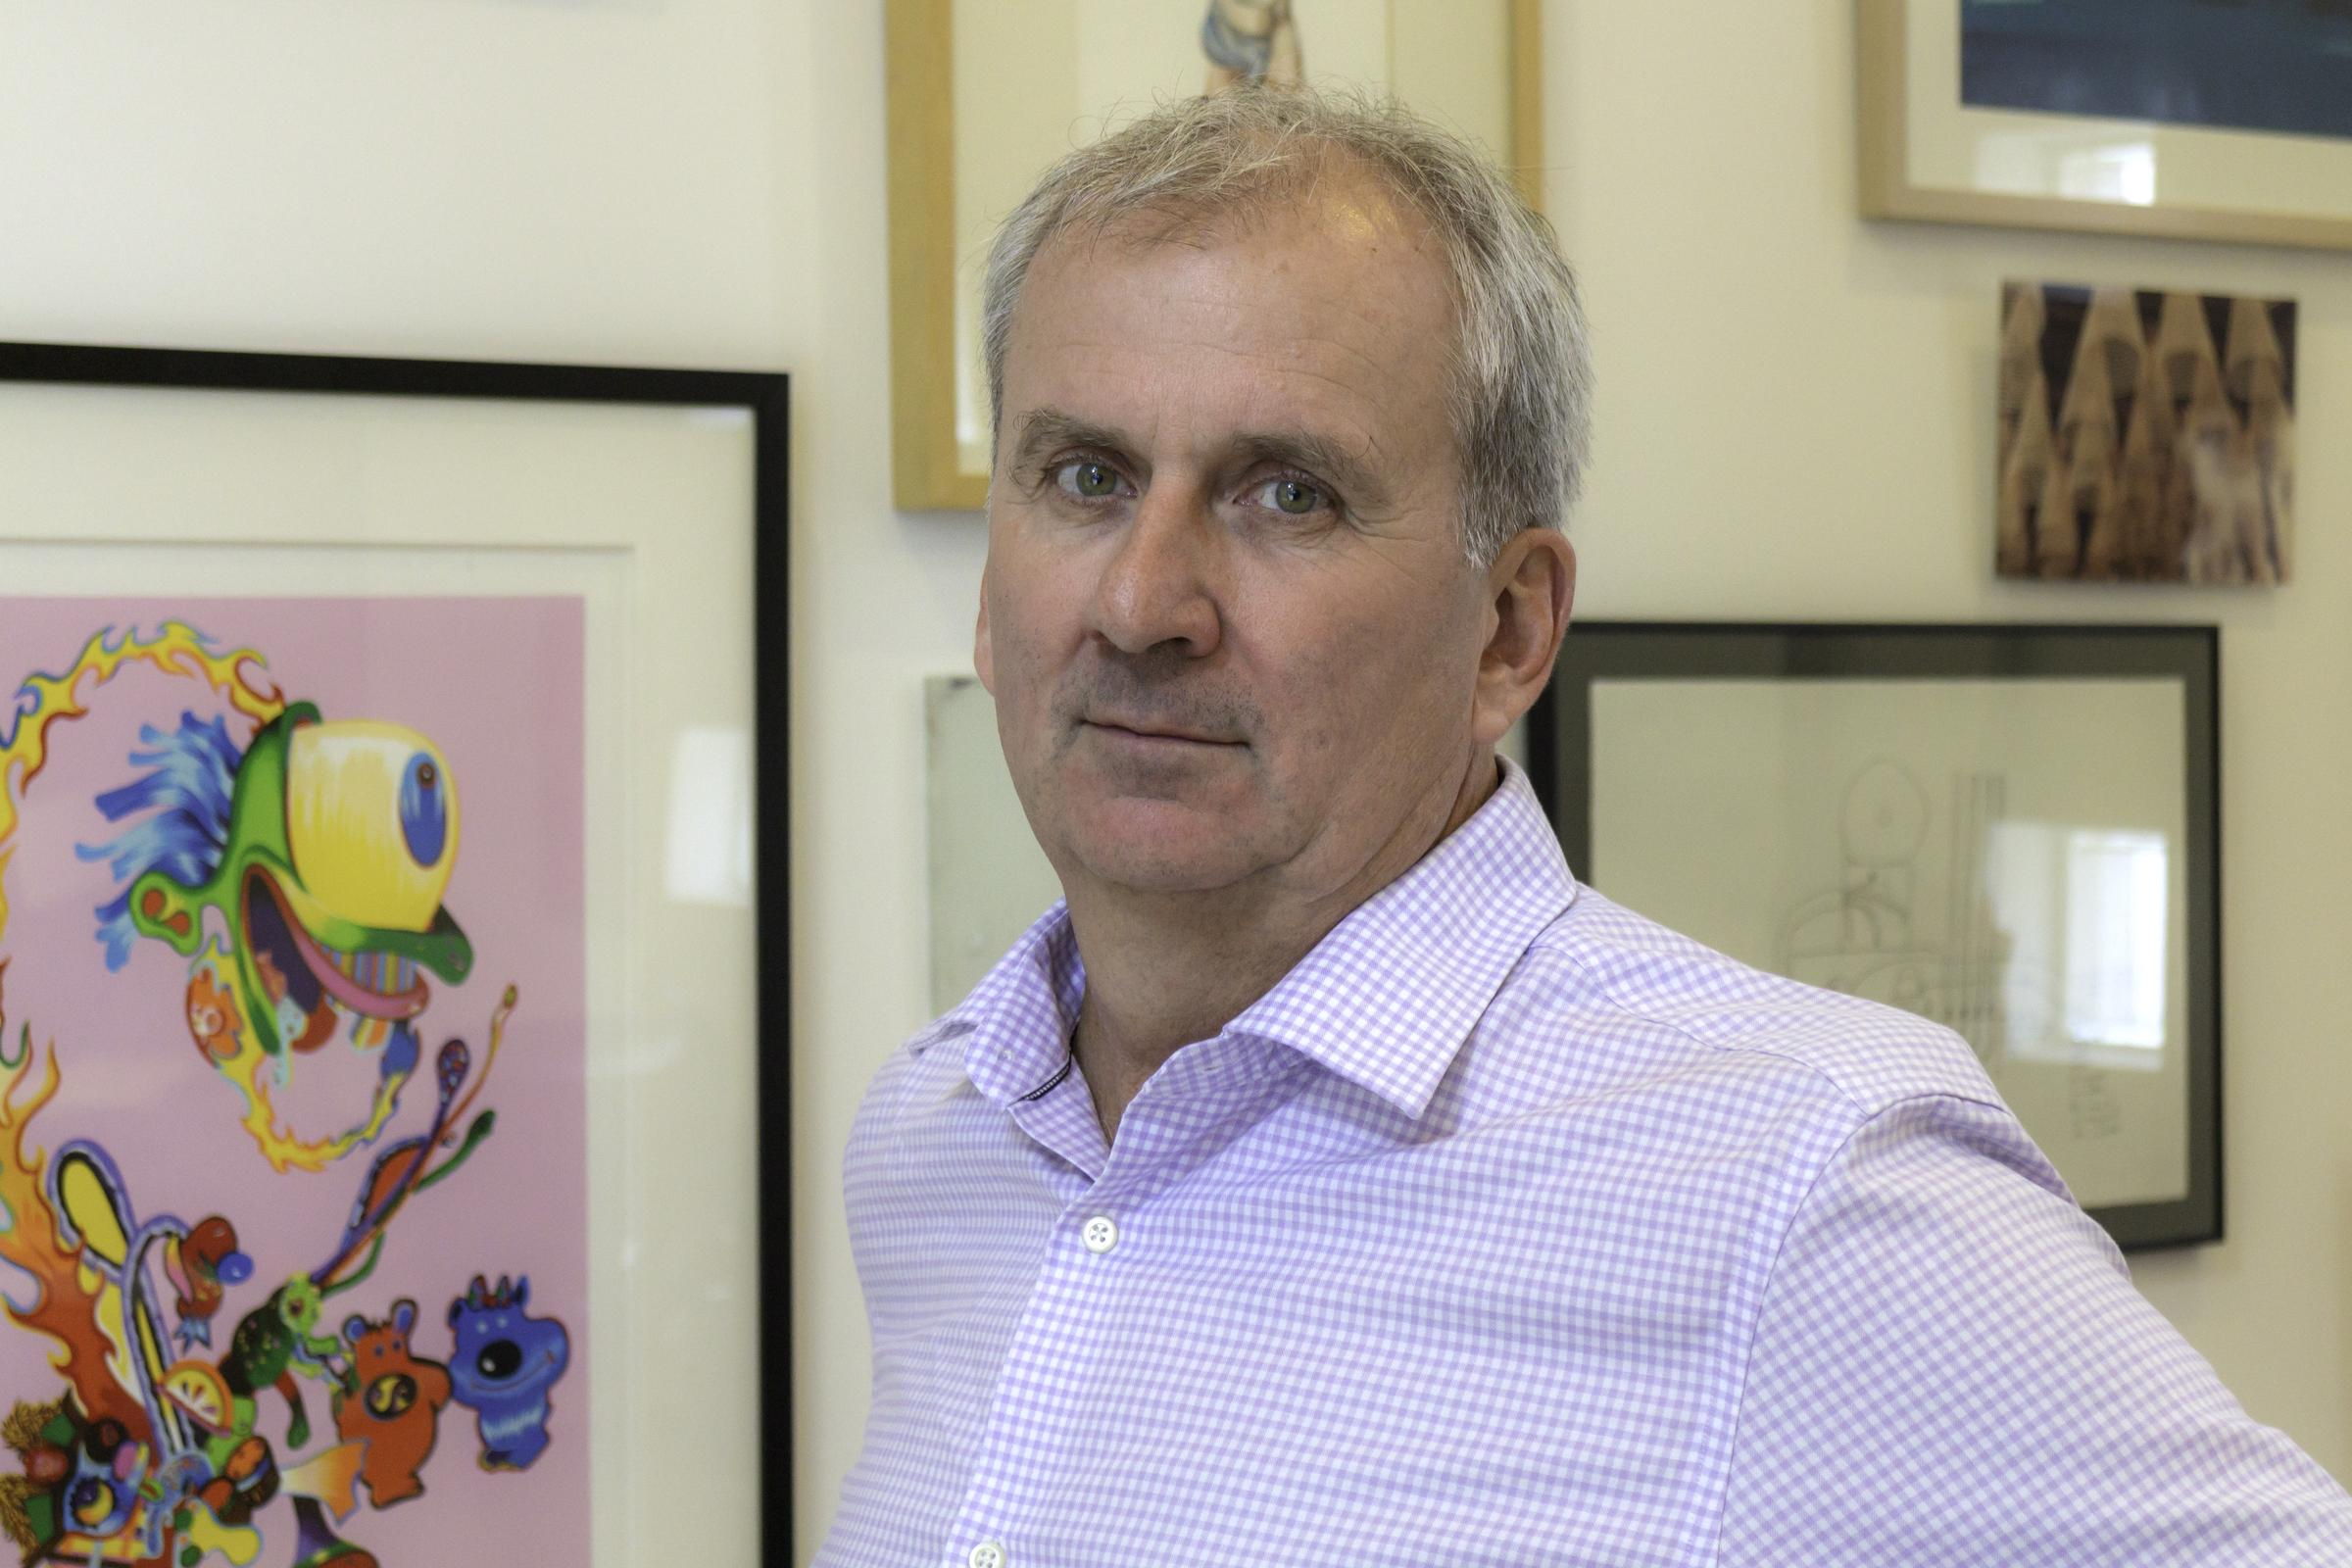 San Antonio S Artpace Selects New Director Texas Public